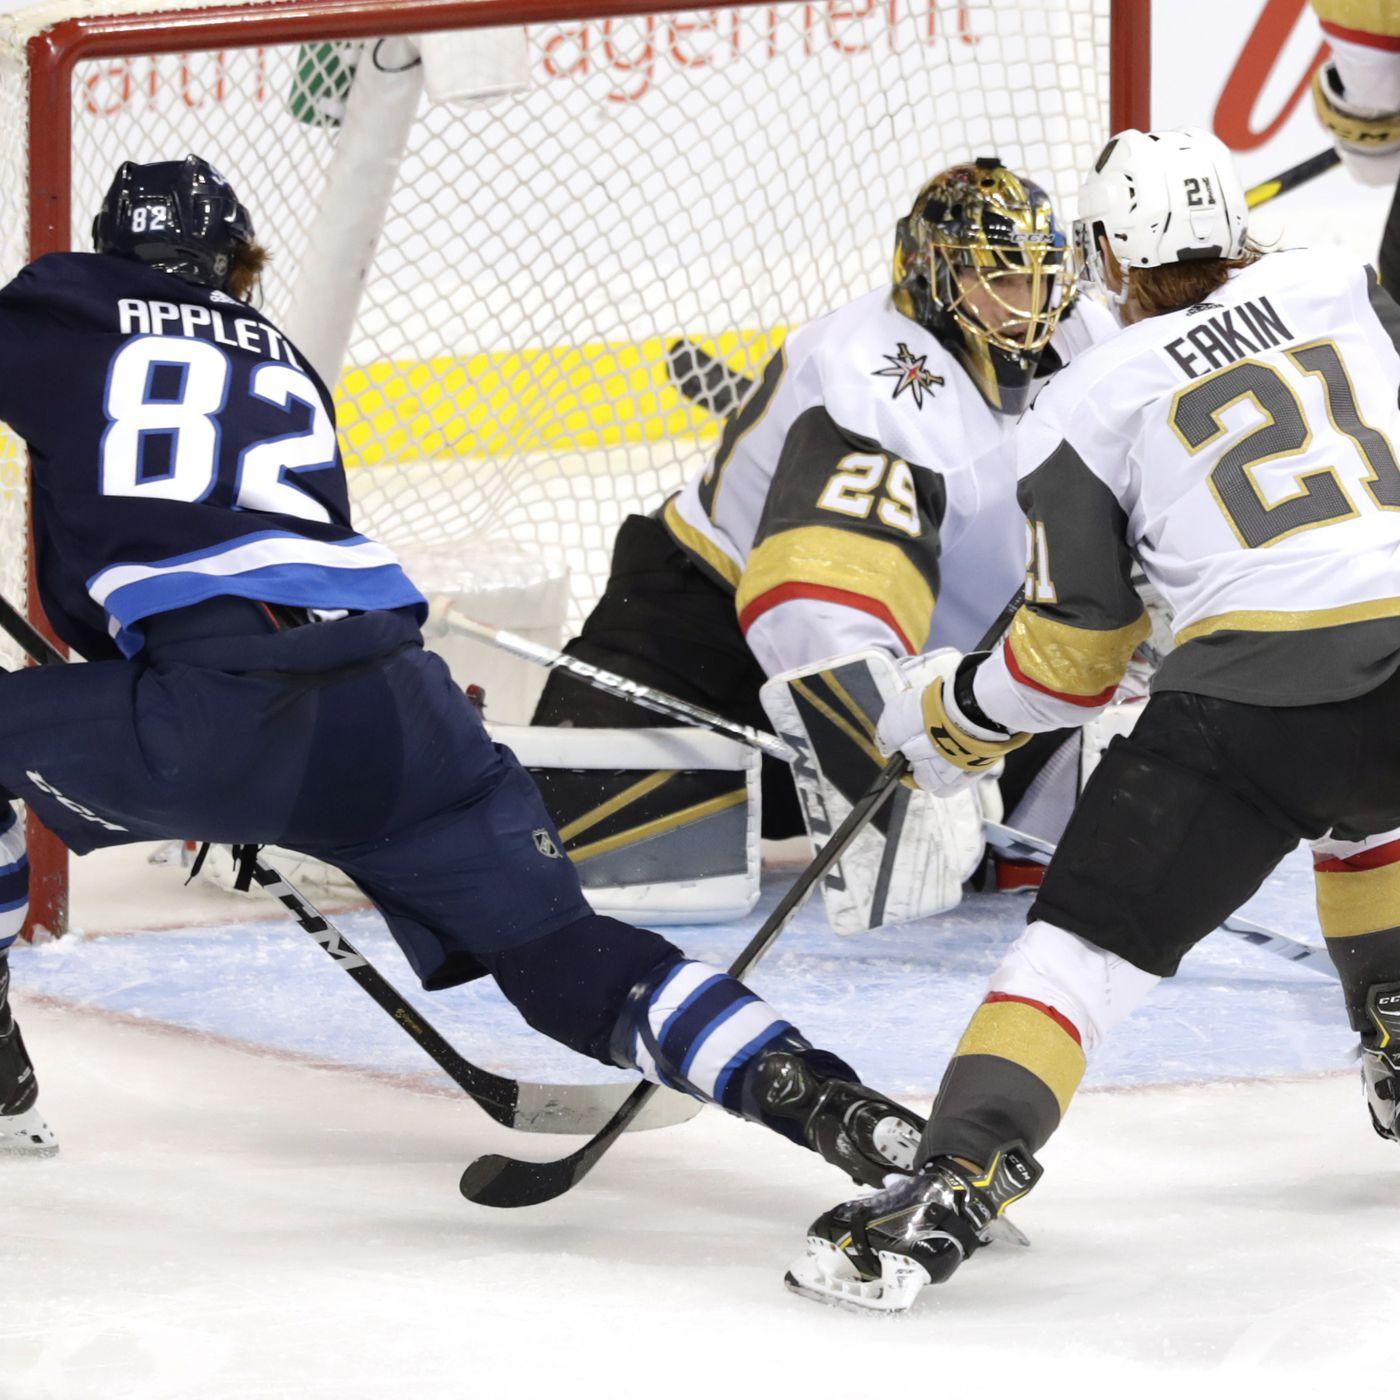 697f7ca5701 Preview: Winnipeg Jets vs Vegas Golden Knights - Arctic Ice Hockey